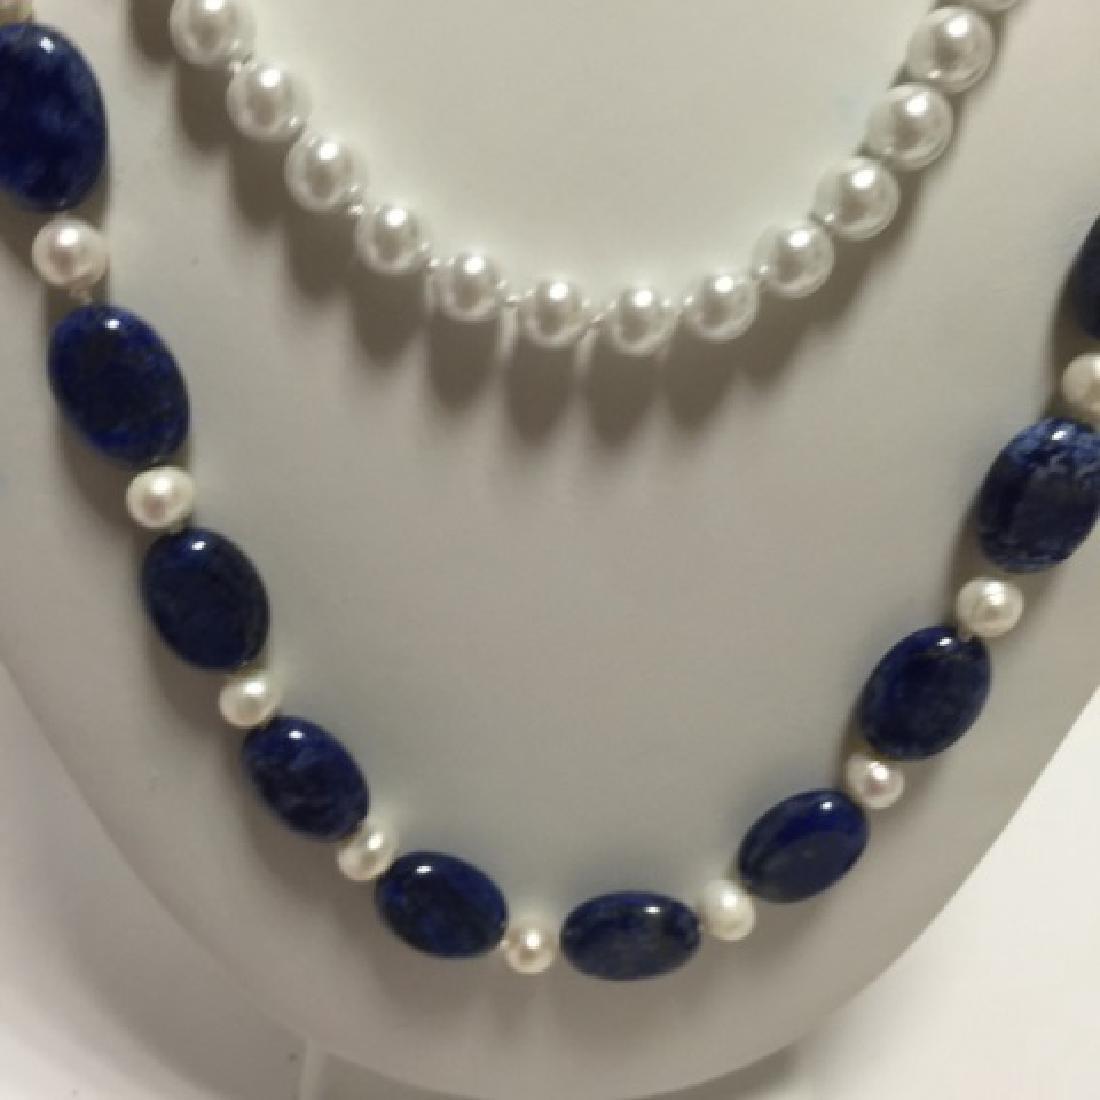 Lapis Lazuli Bead & Baroque Style Pearl Necklace - 4